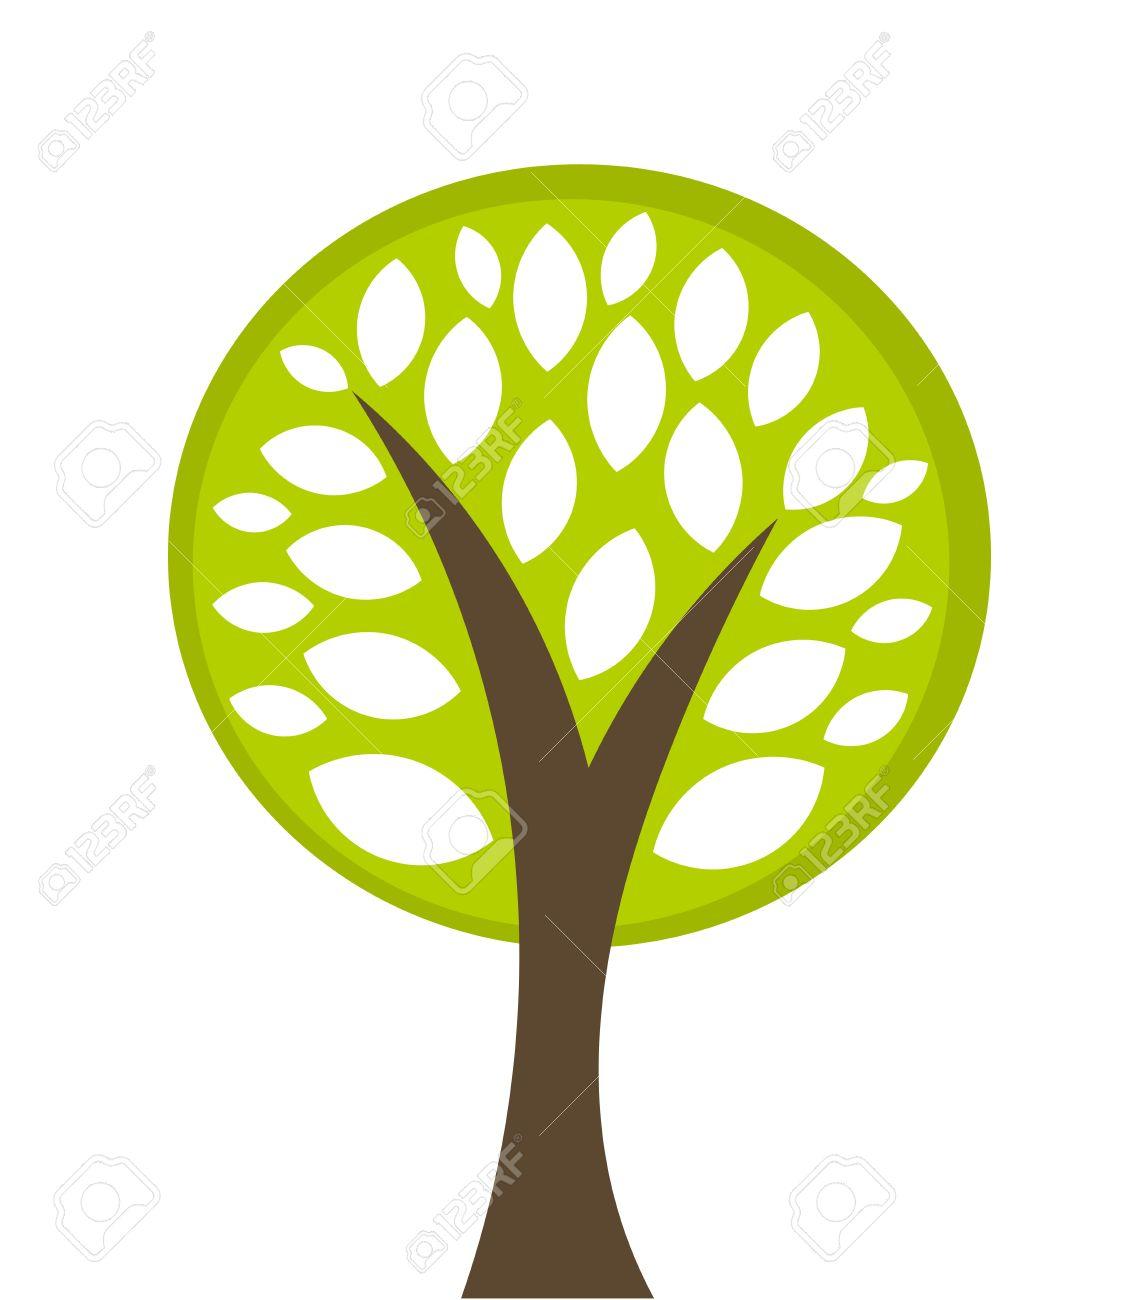 Eco tree symbol illustration Stock Vector - 19905724